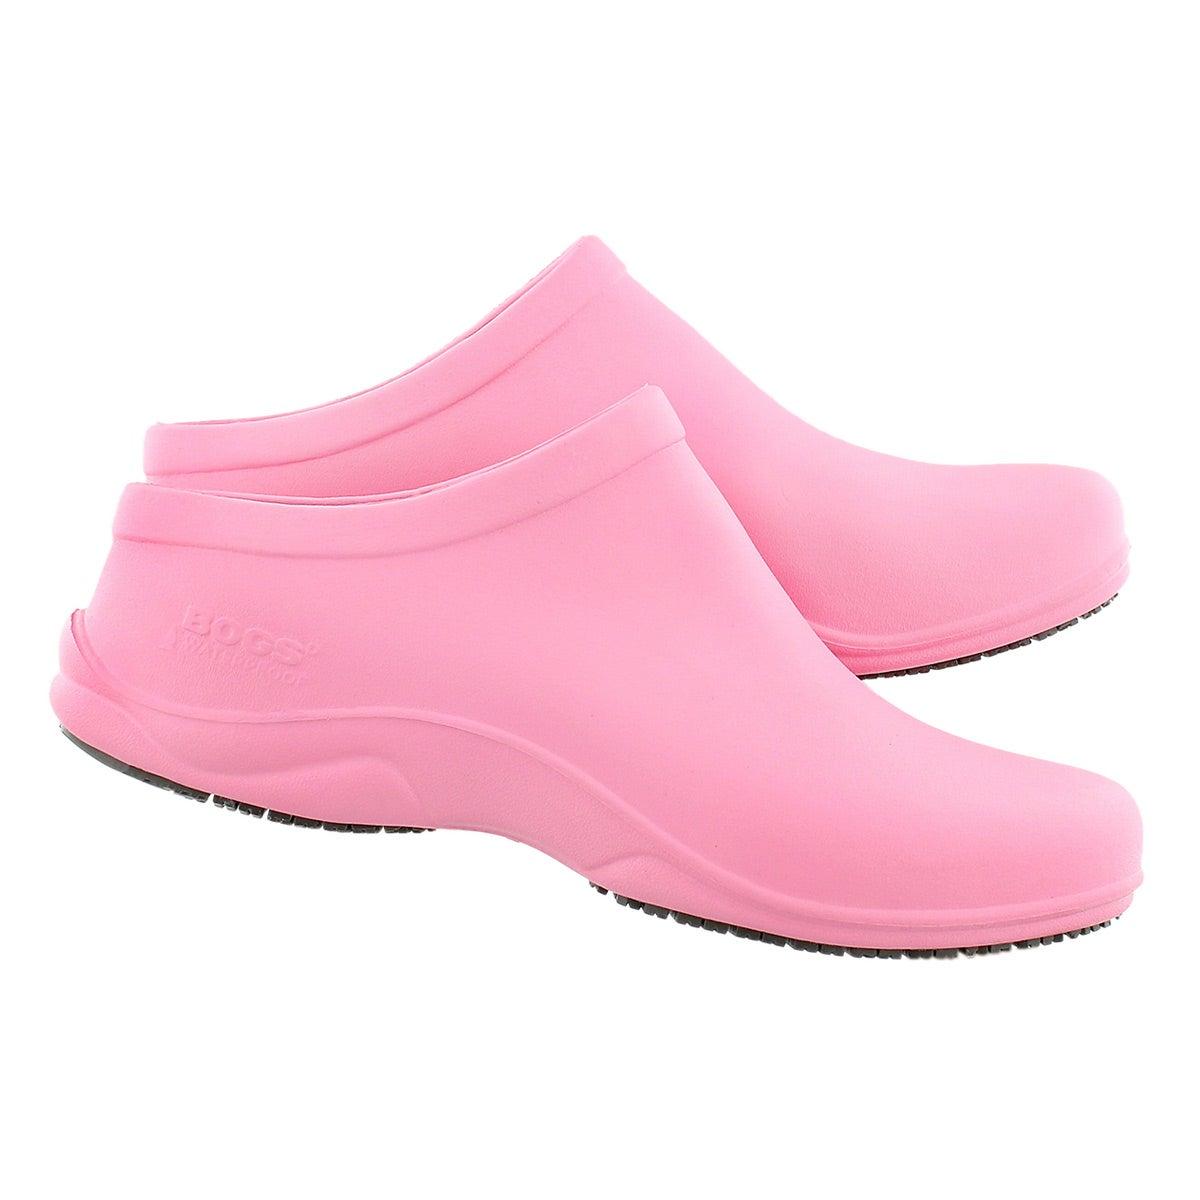 Lds Stewart pink wtpf anti-slip clog